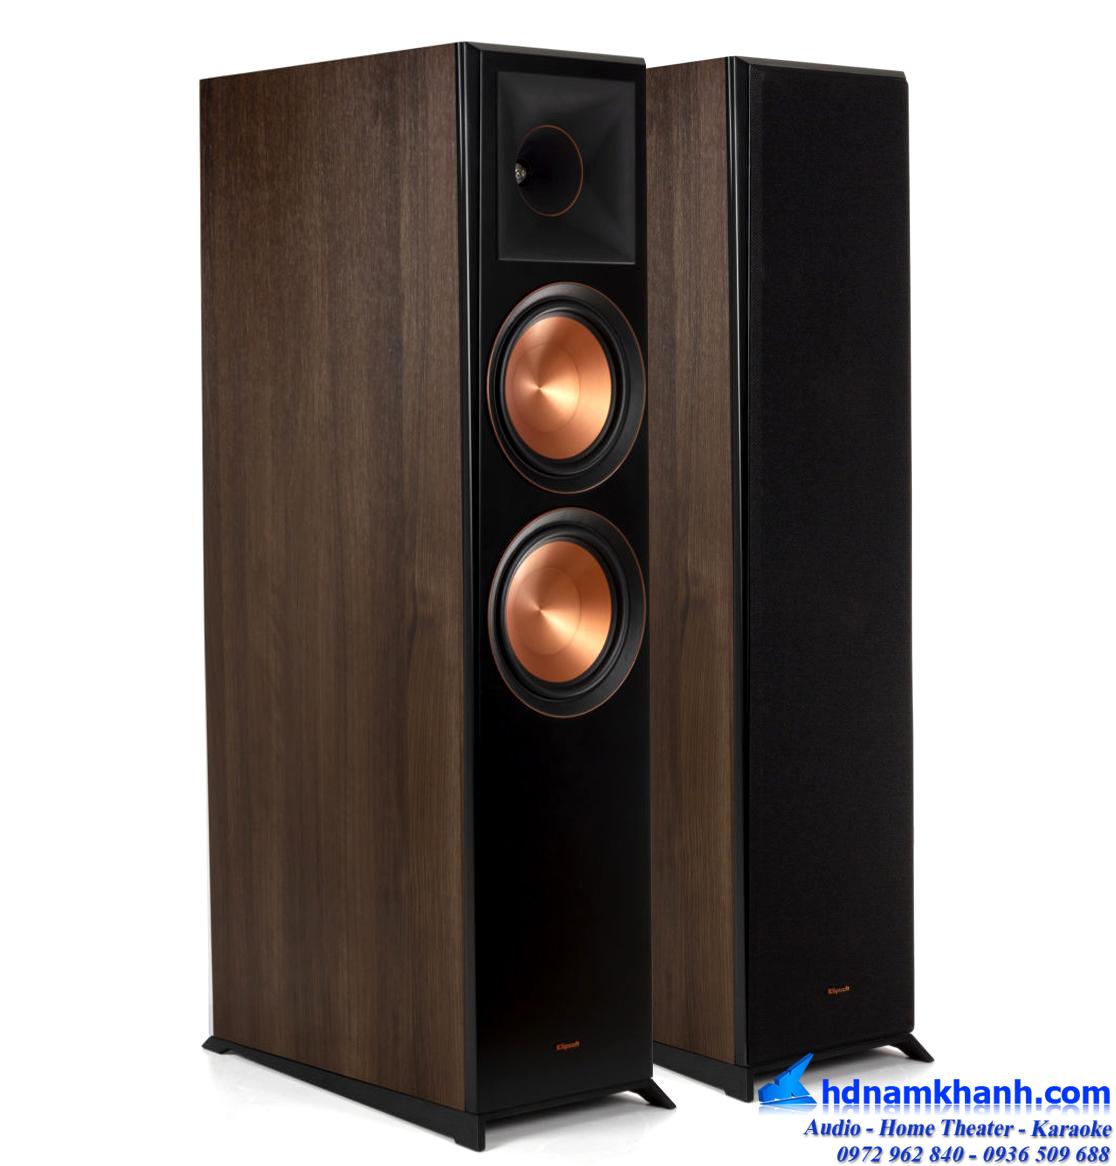 Loa Klipsch RP-8060FA, Loa Dolby Atmos cao cấp của dòng Klipsch RP